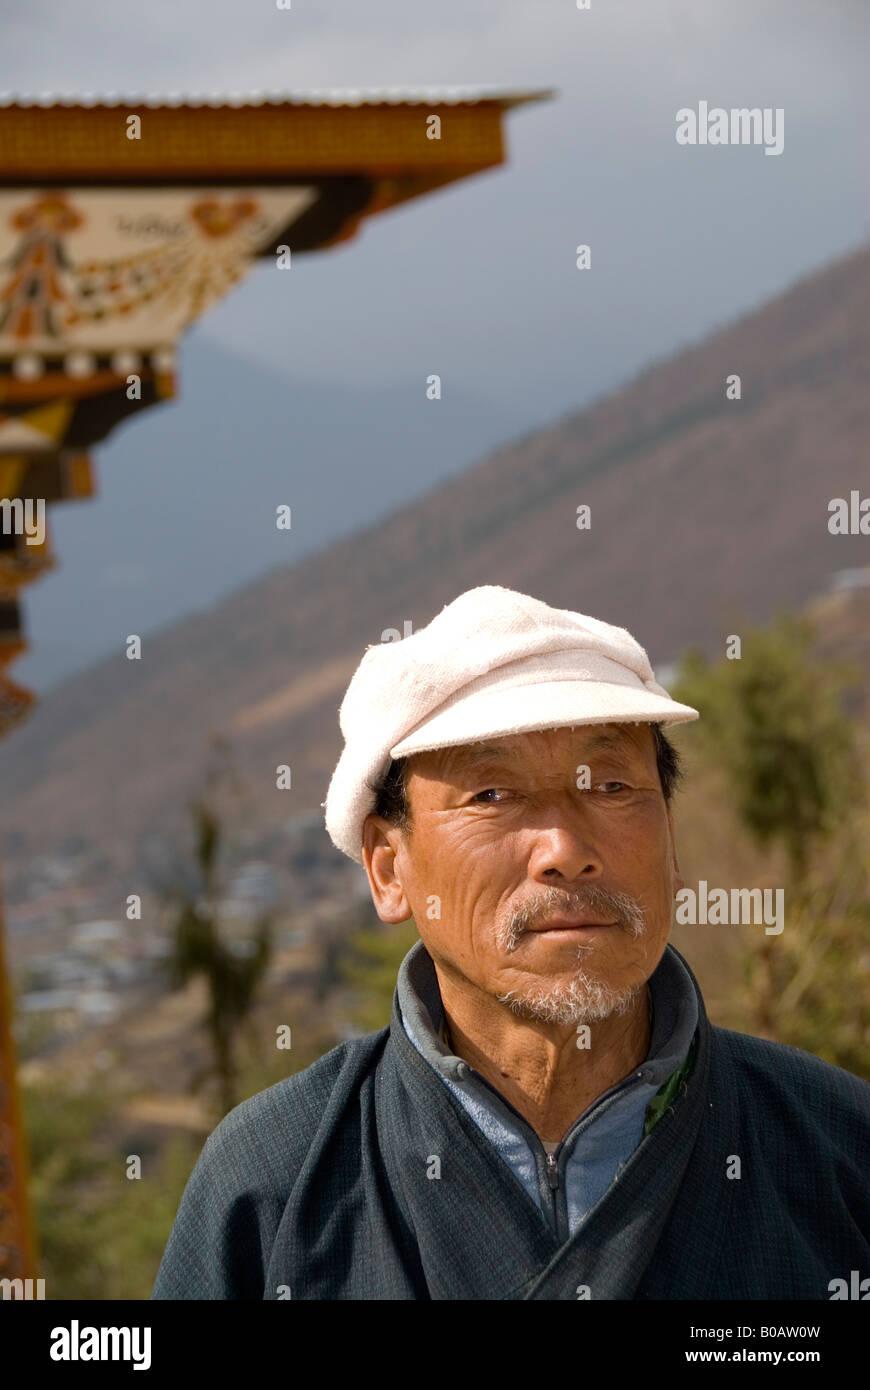 Construction bhoutanais contremaître pour rénovation de Trashi Chhoe Dzong, Thimphu, Bhoutan Photo Stock